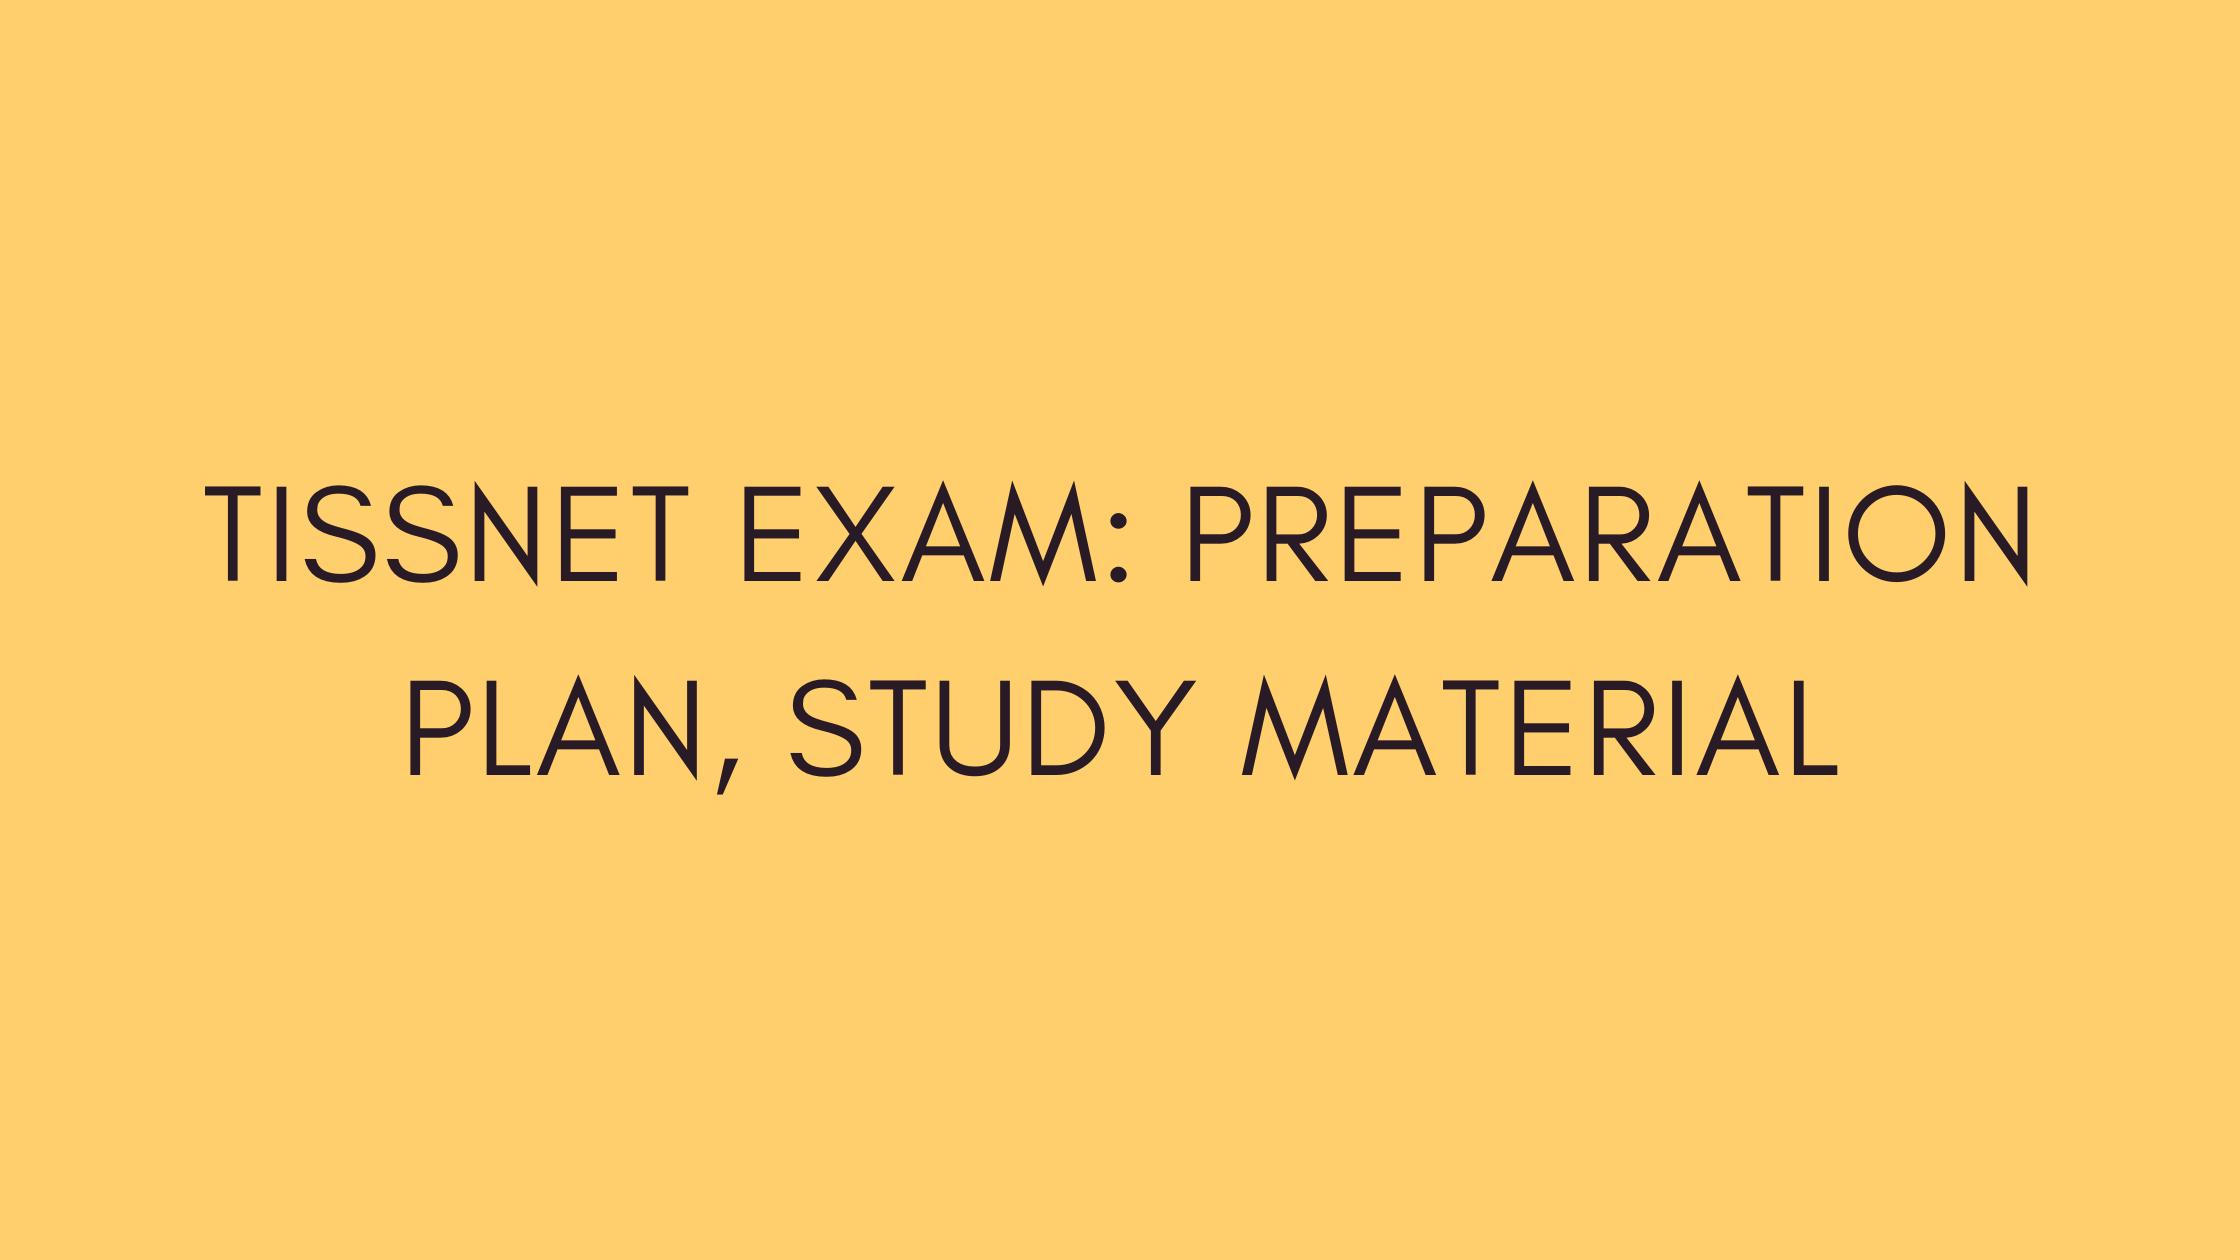 Preparation Plan For TISSNET Exam 2022, TISSNET Study Material